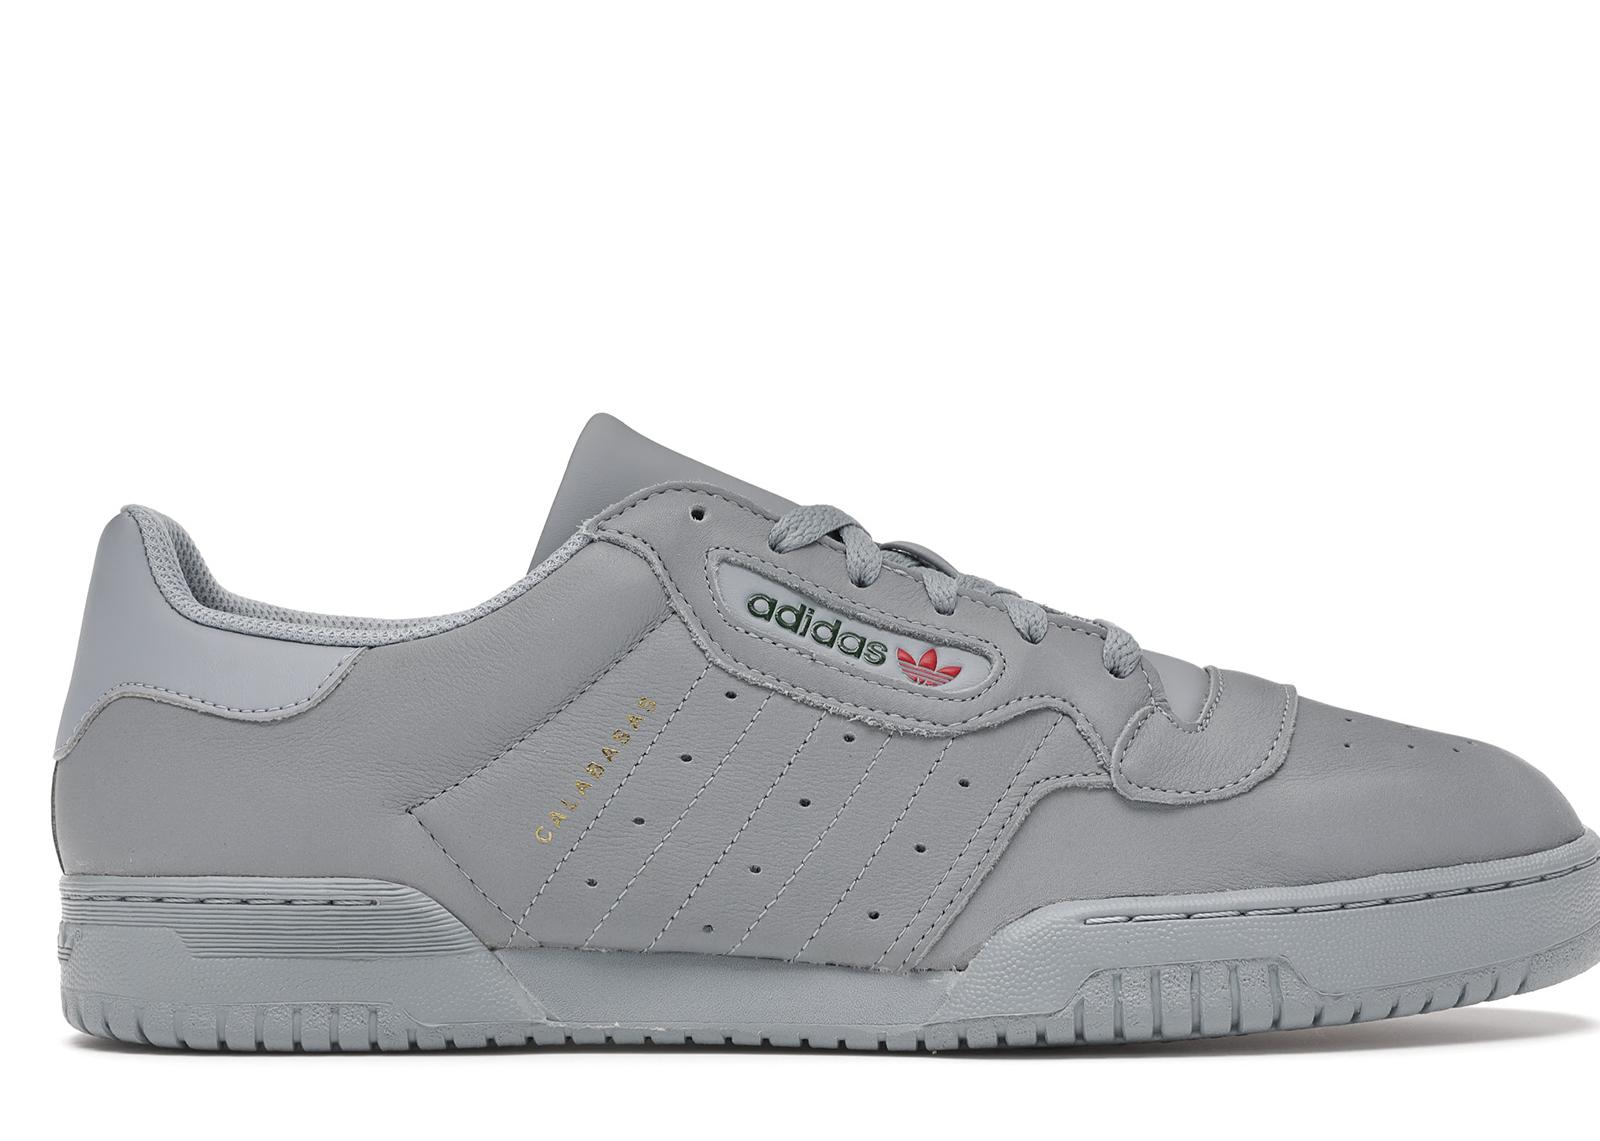 adidas Yeezy Powerphase Calabasas Grey - CG6422